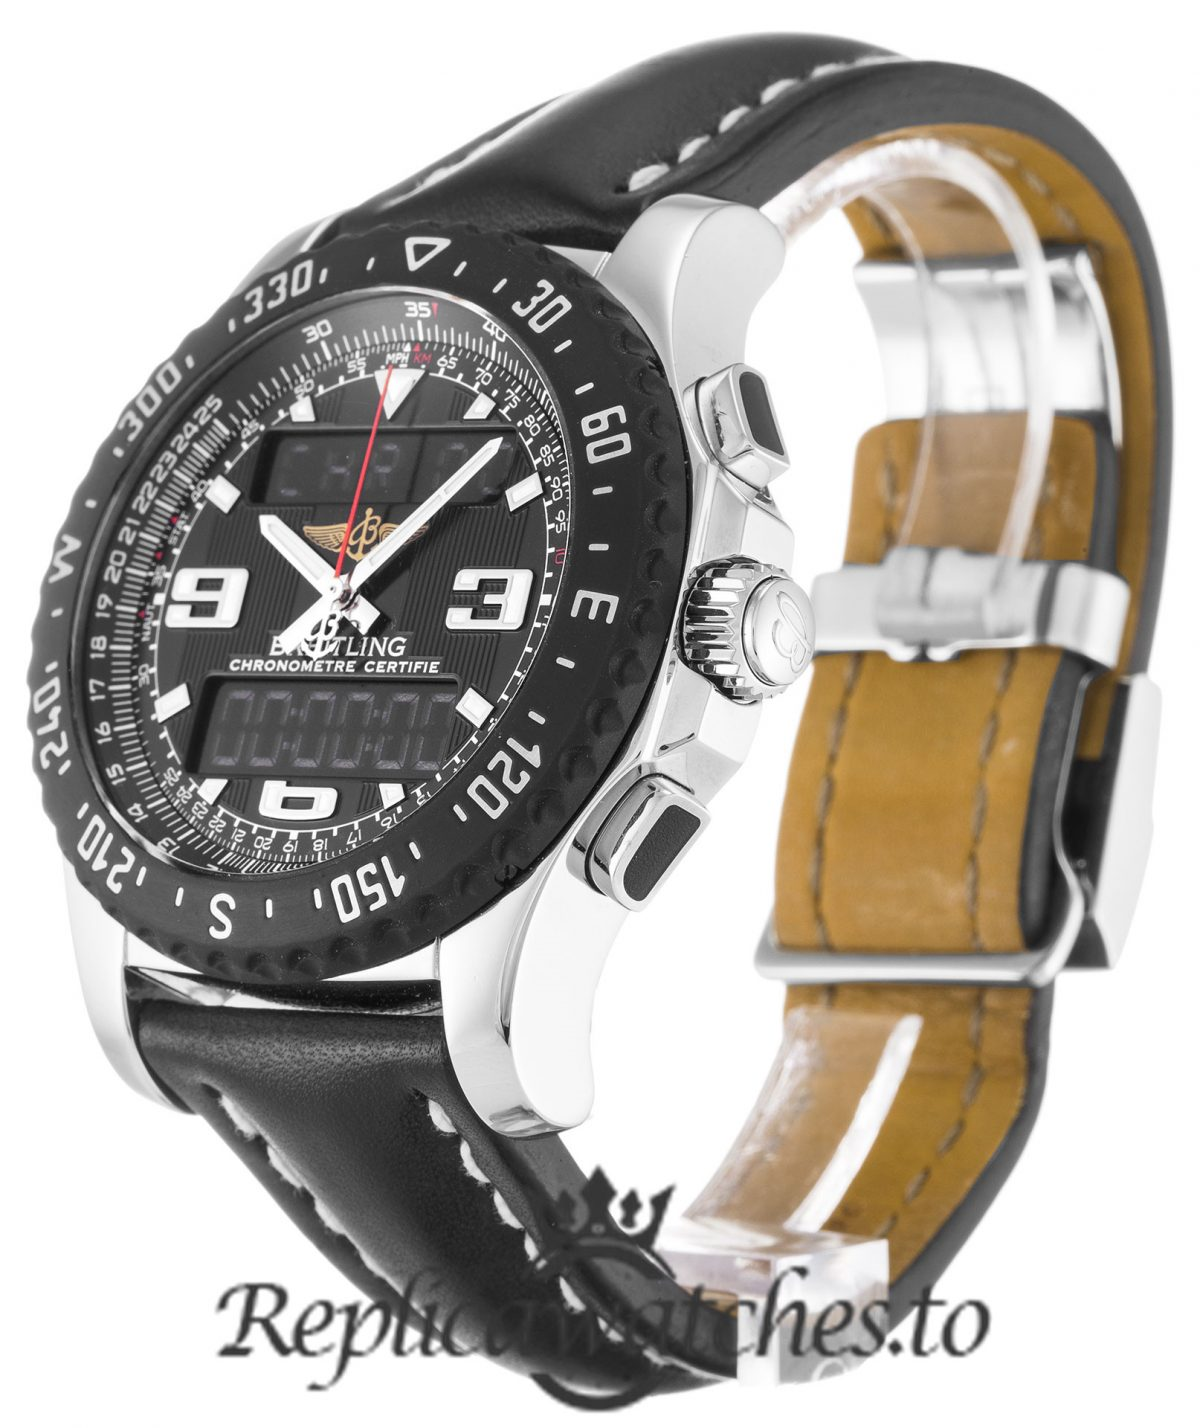 Breitling Bentley Replica A78364 Black Strap 43.5MM